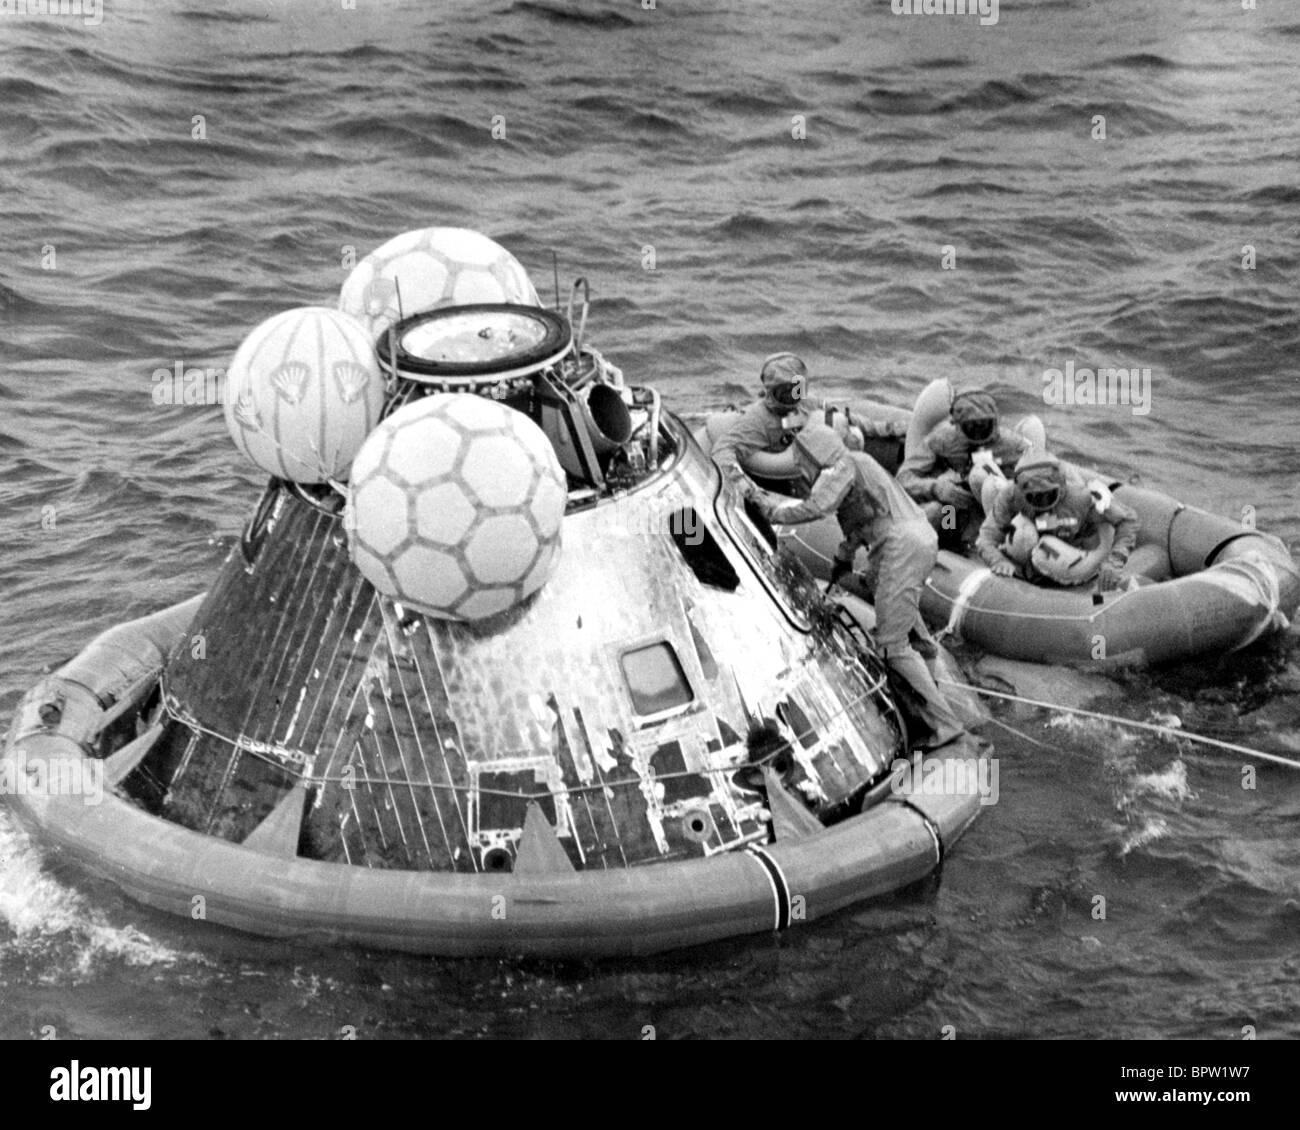 super apollo space capsule - photo #27